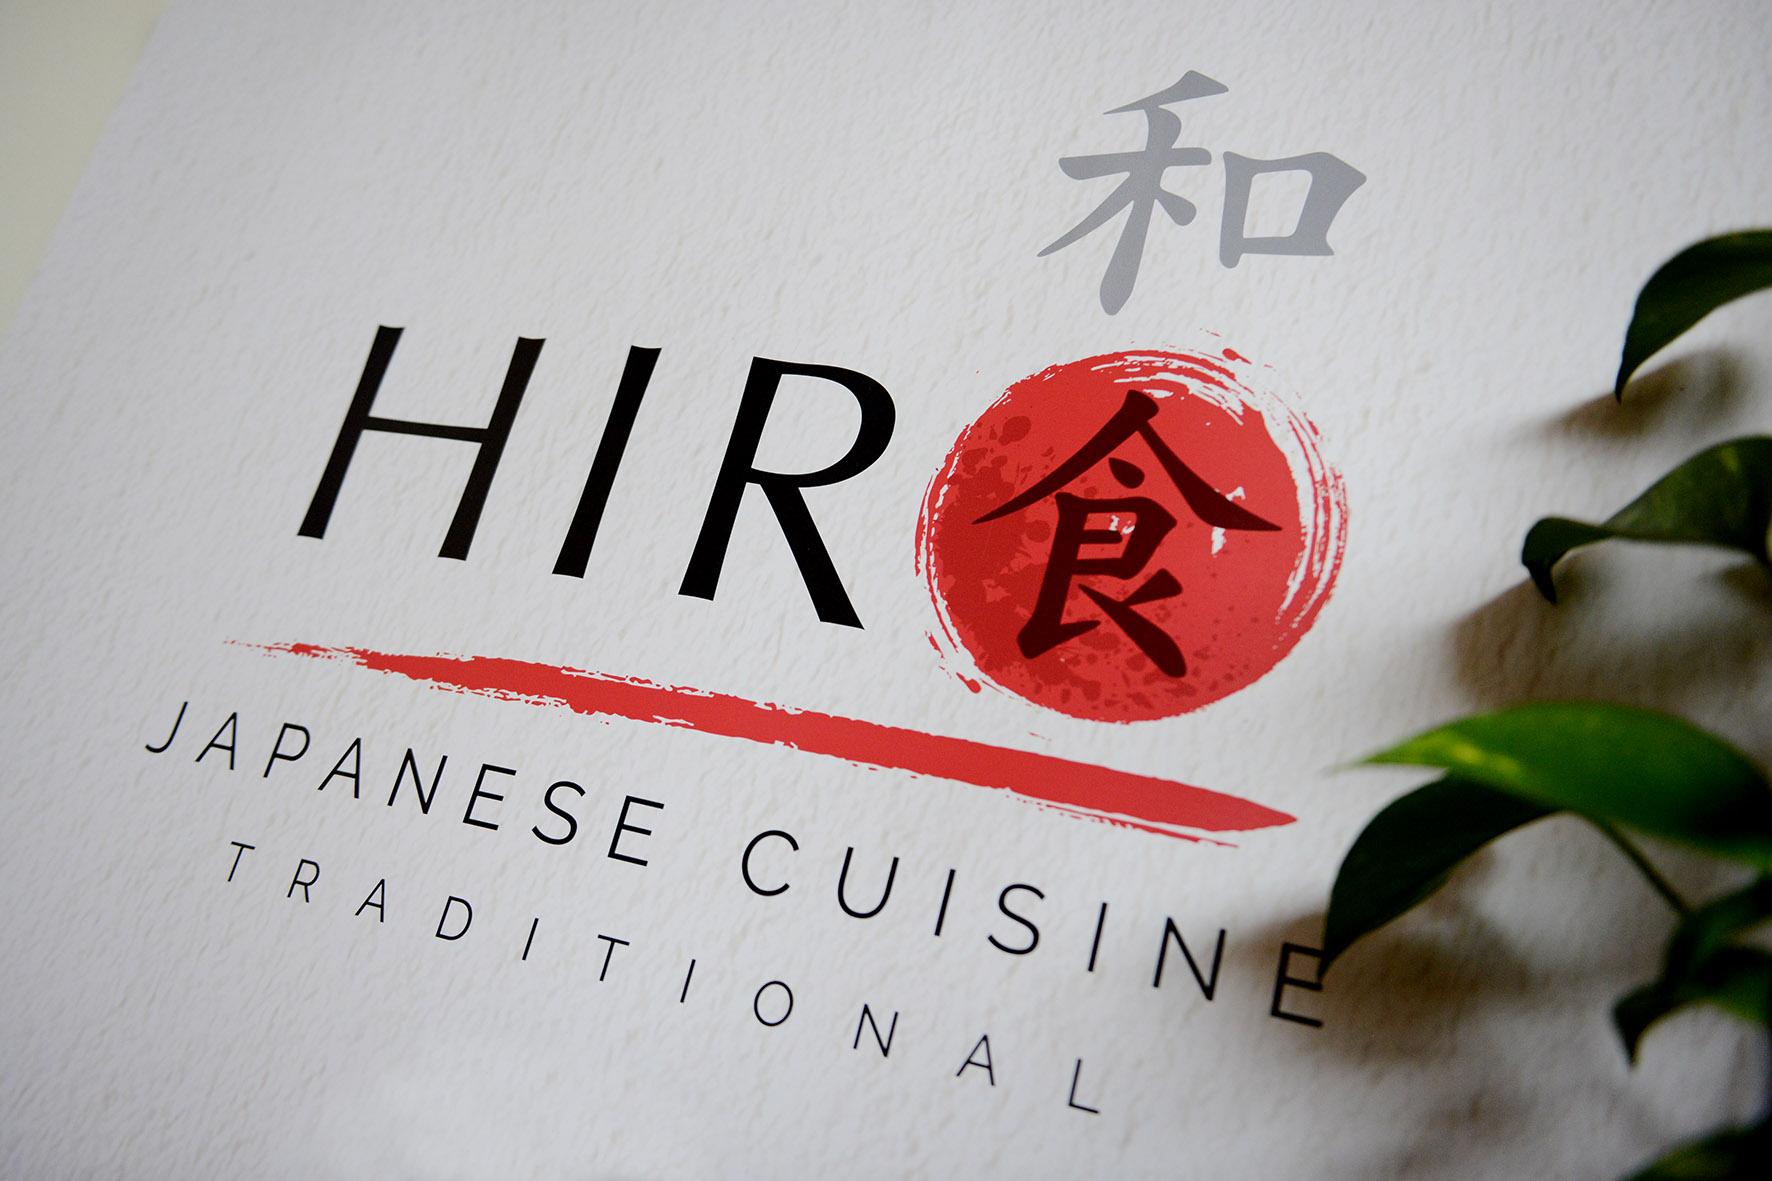 HIRO - Japanese Cuisine